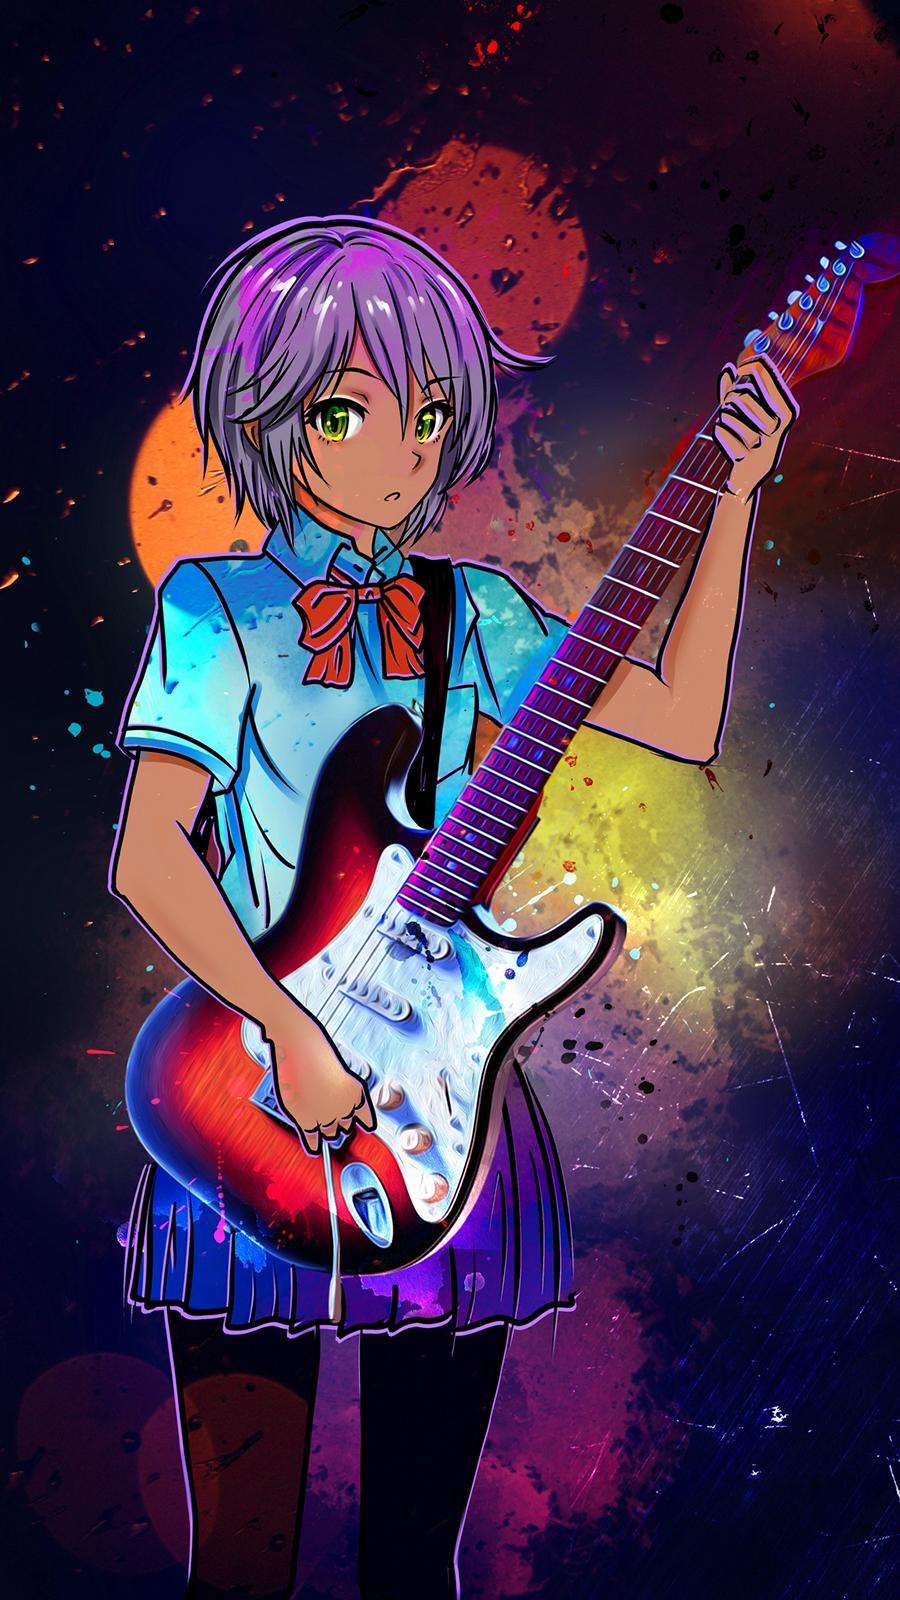 Anime Cartoon Girl Wallpapers Free Download